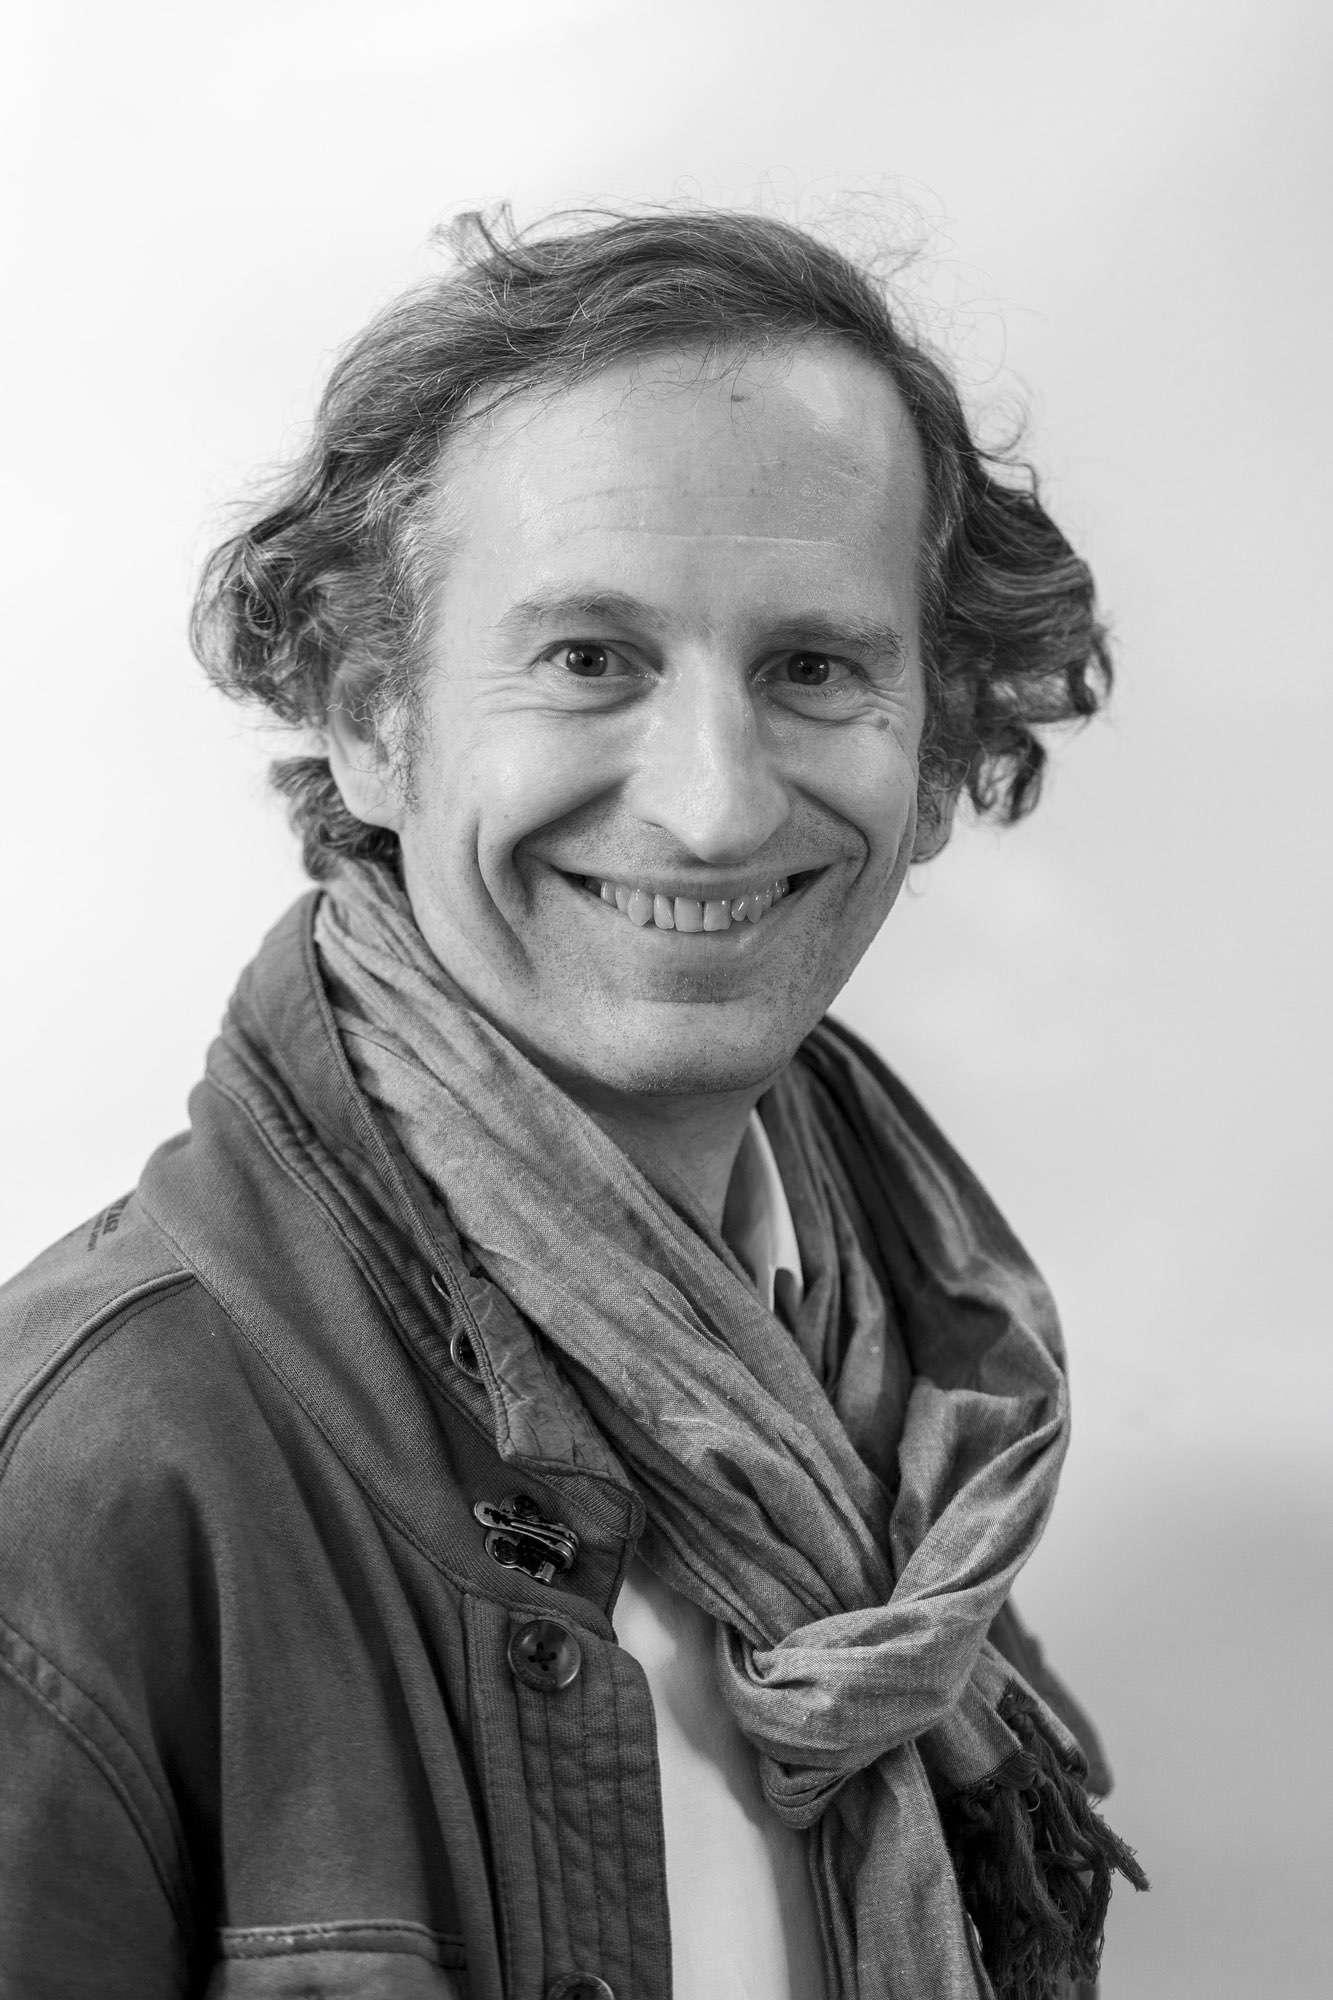 Gregor Morokutti